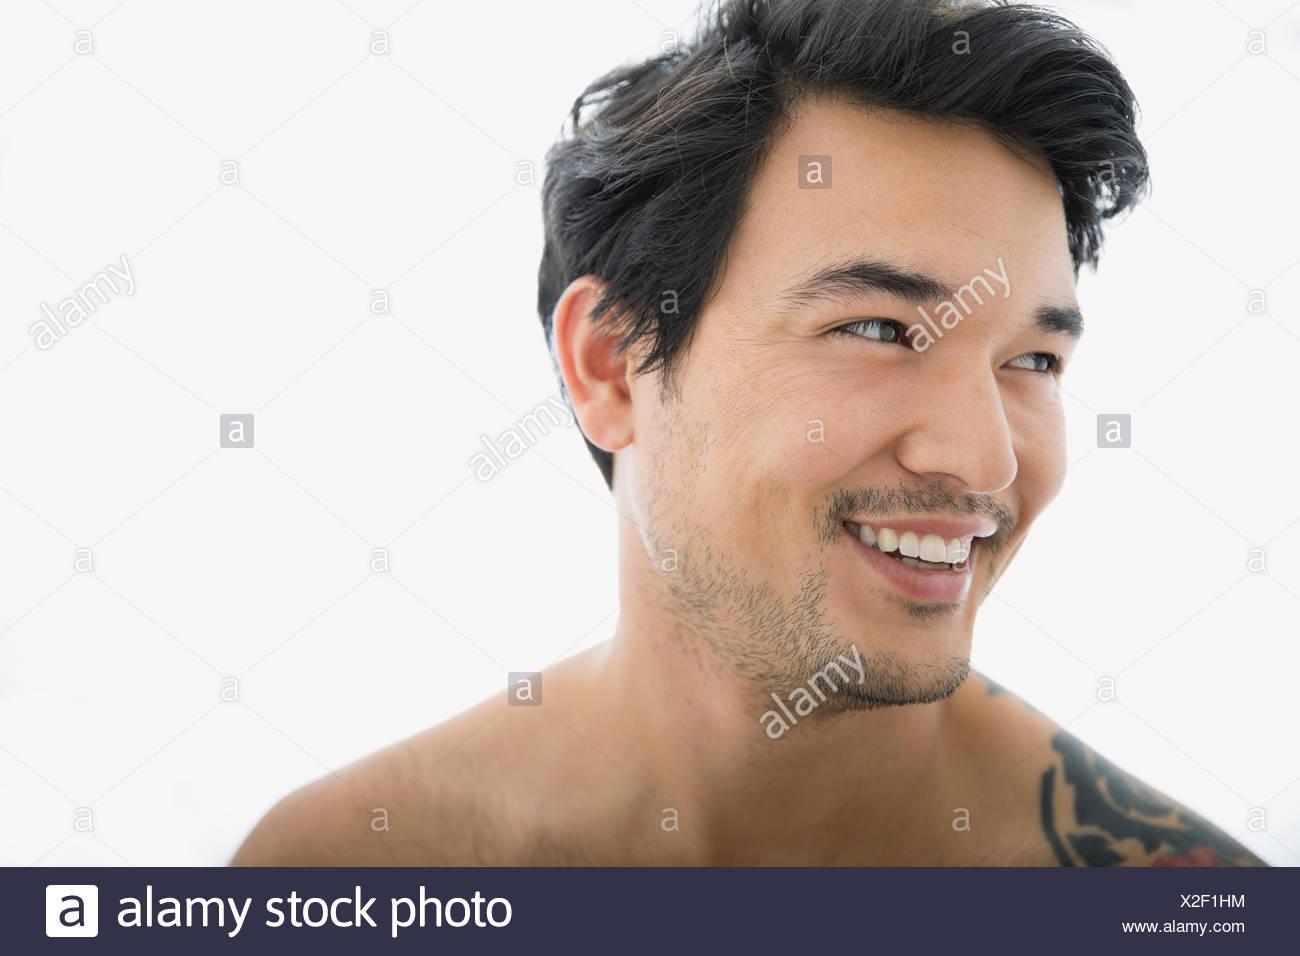 Hombre sonriendo con cabello negro en busca de distancia Foto de stock